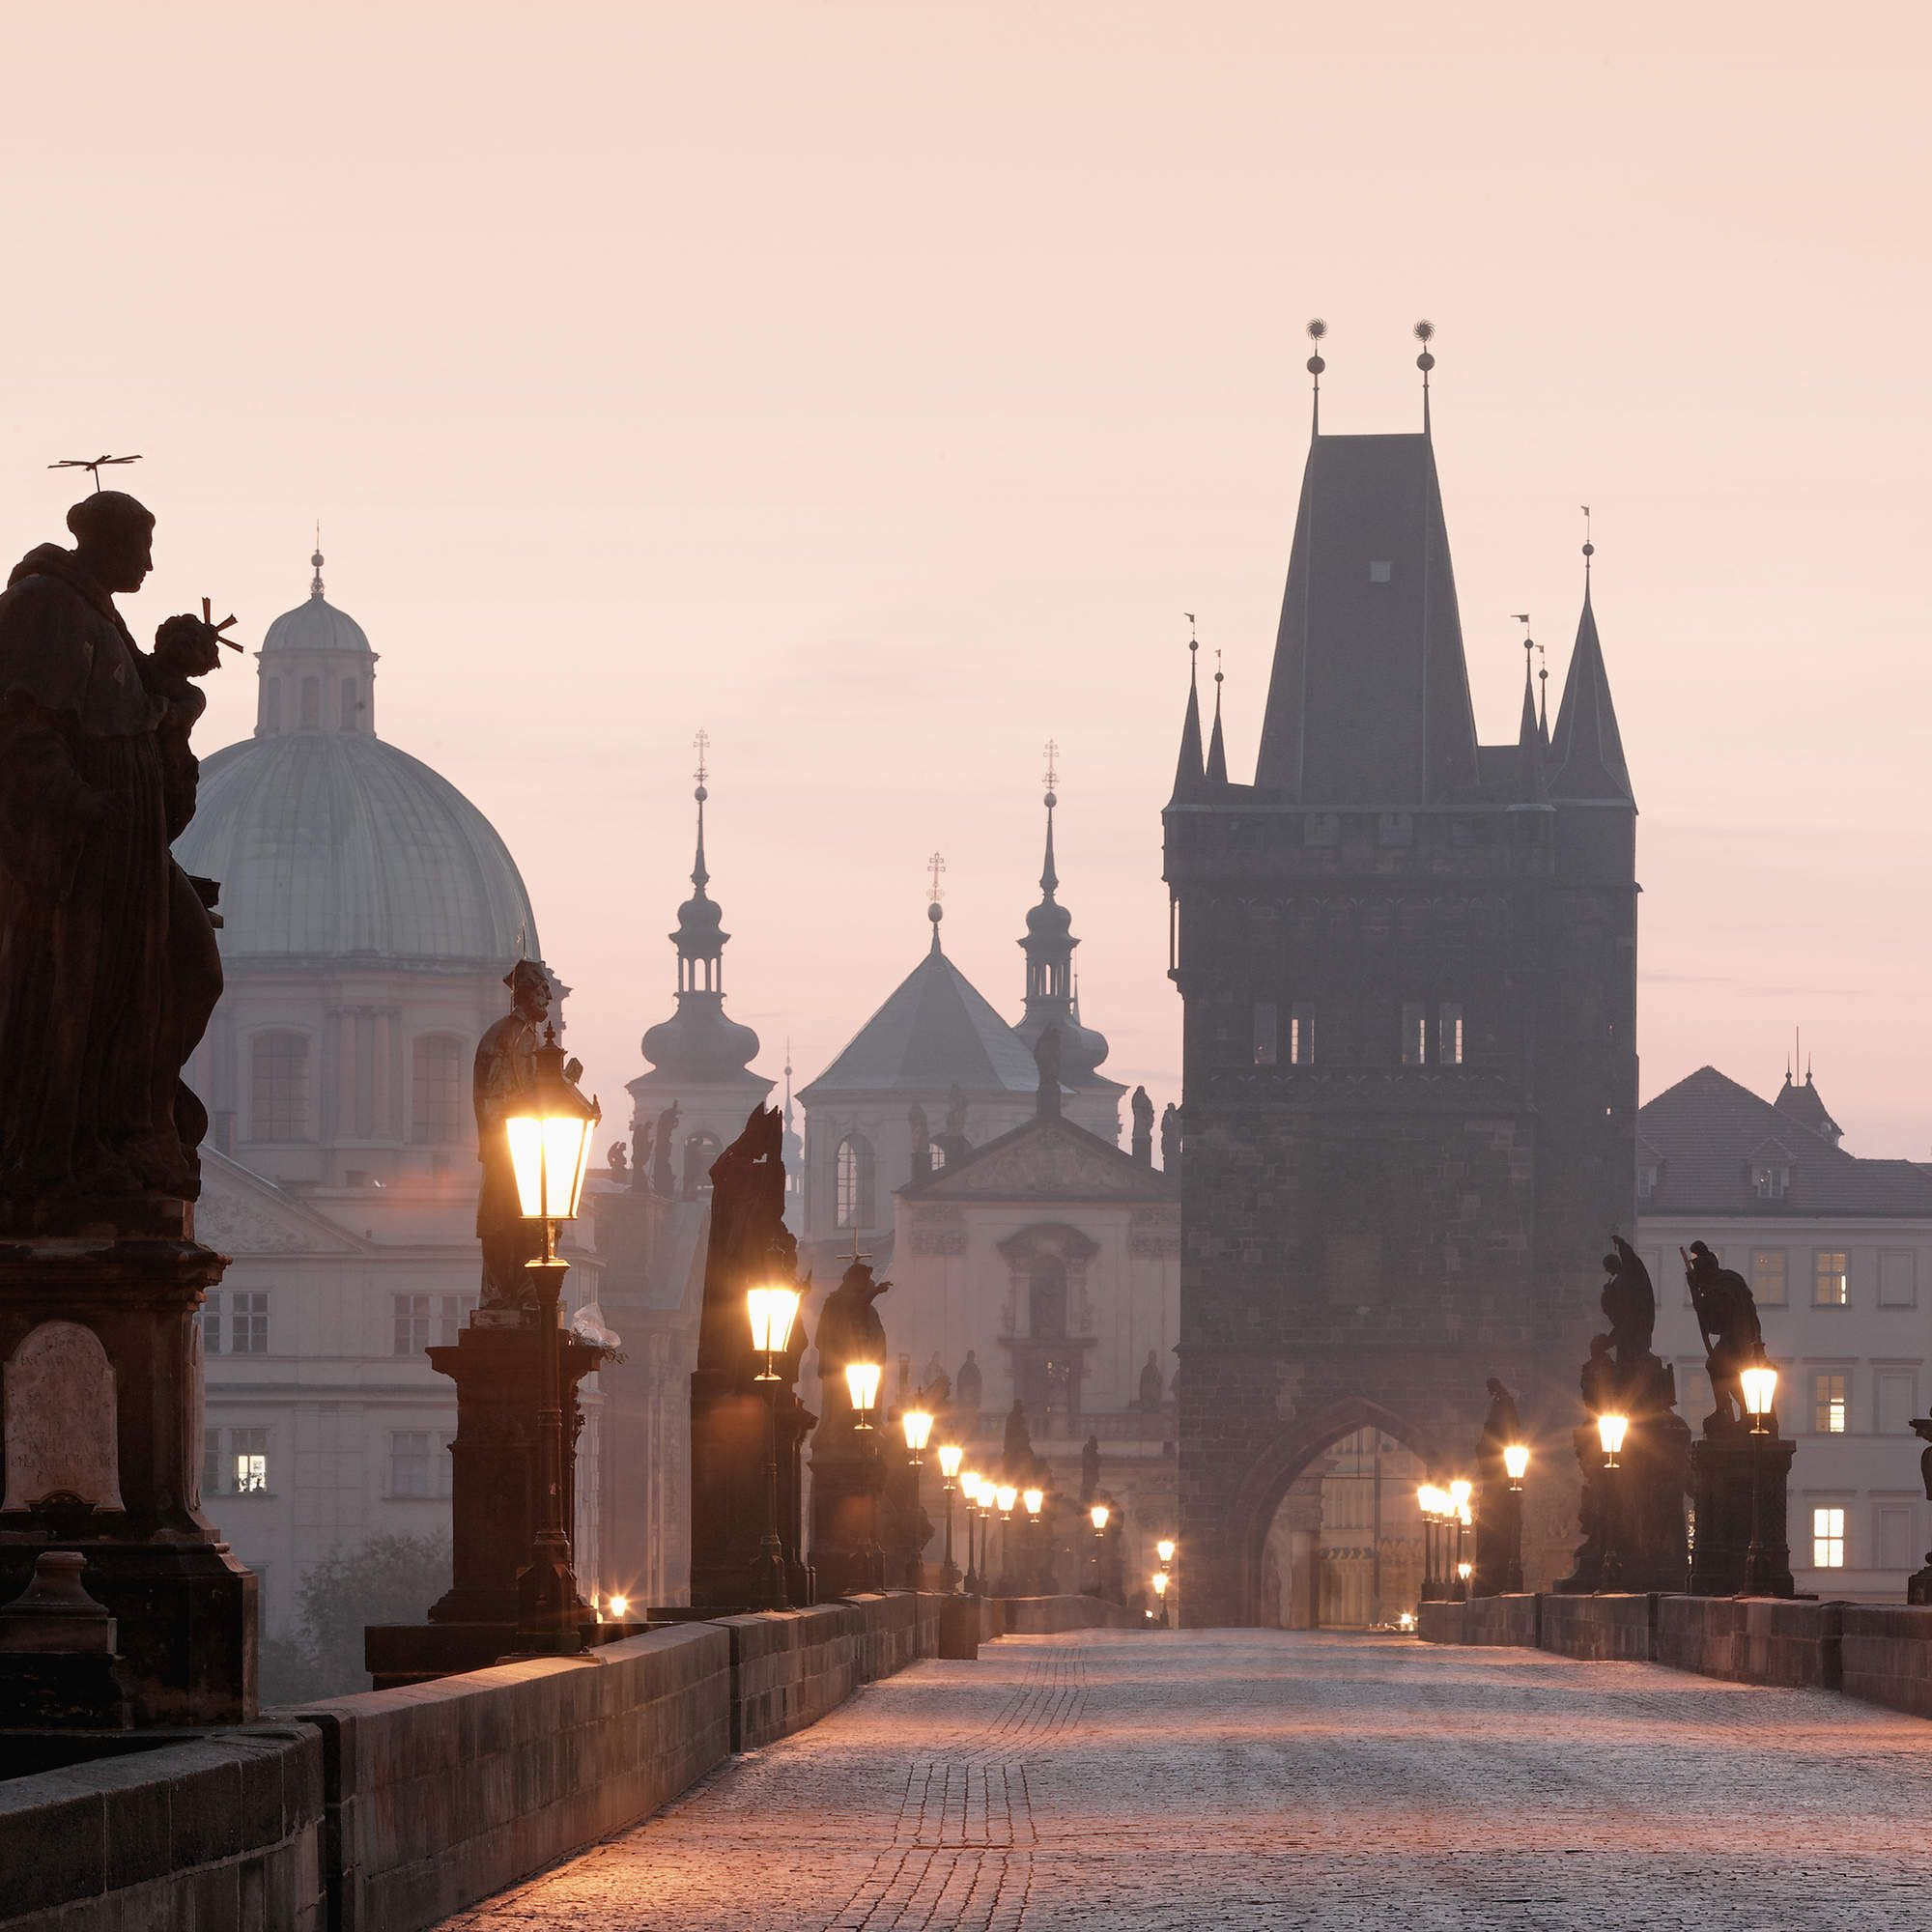 50 Bucket List Ideas For Your Next Dream Trip Charles Bridge Prague Prague Charles Bridge